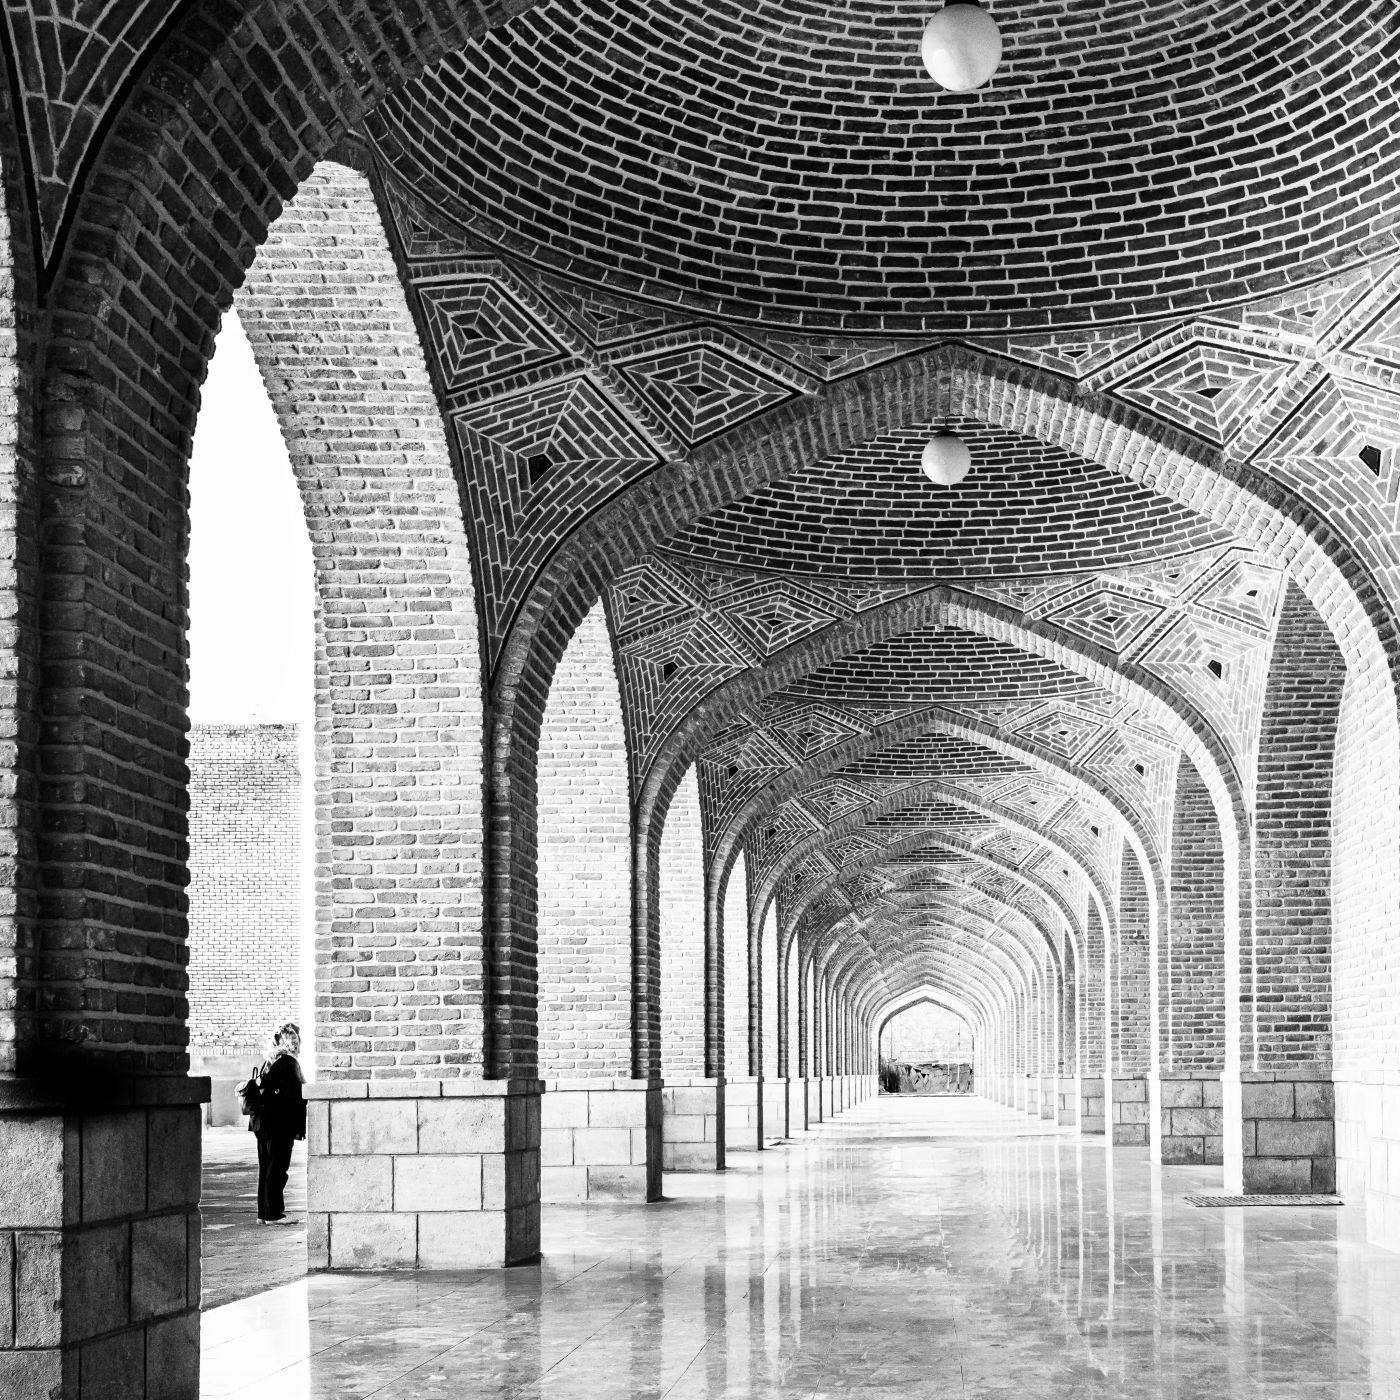 Kabud Mosque, Blue Mosque, Iran